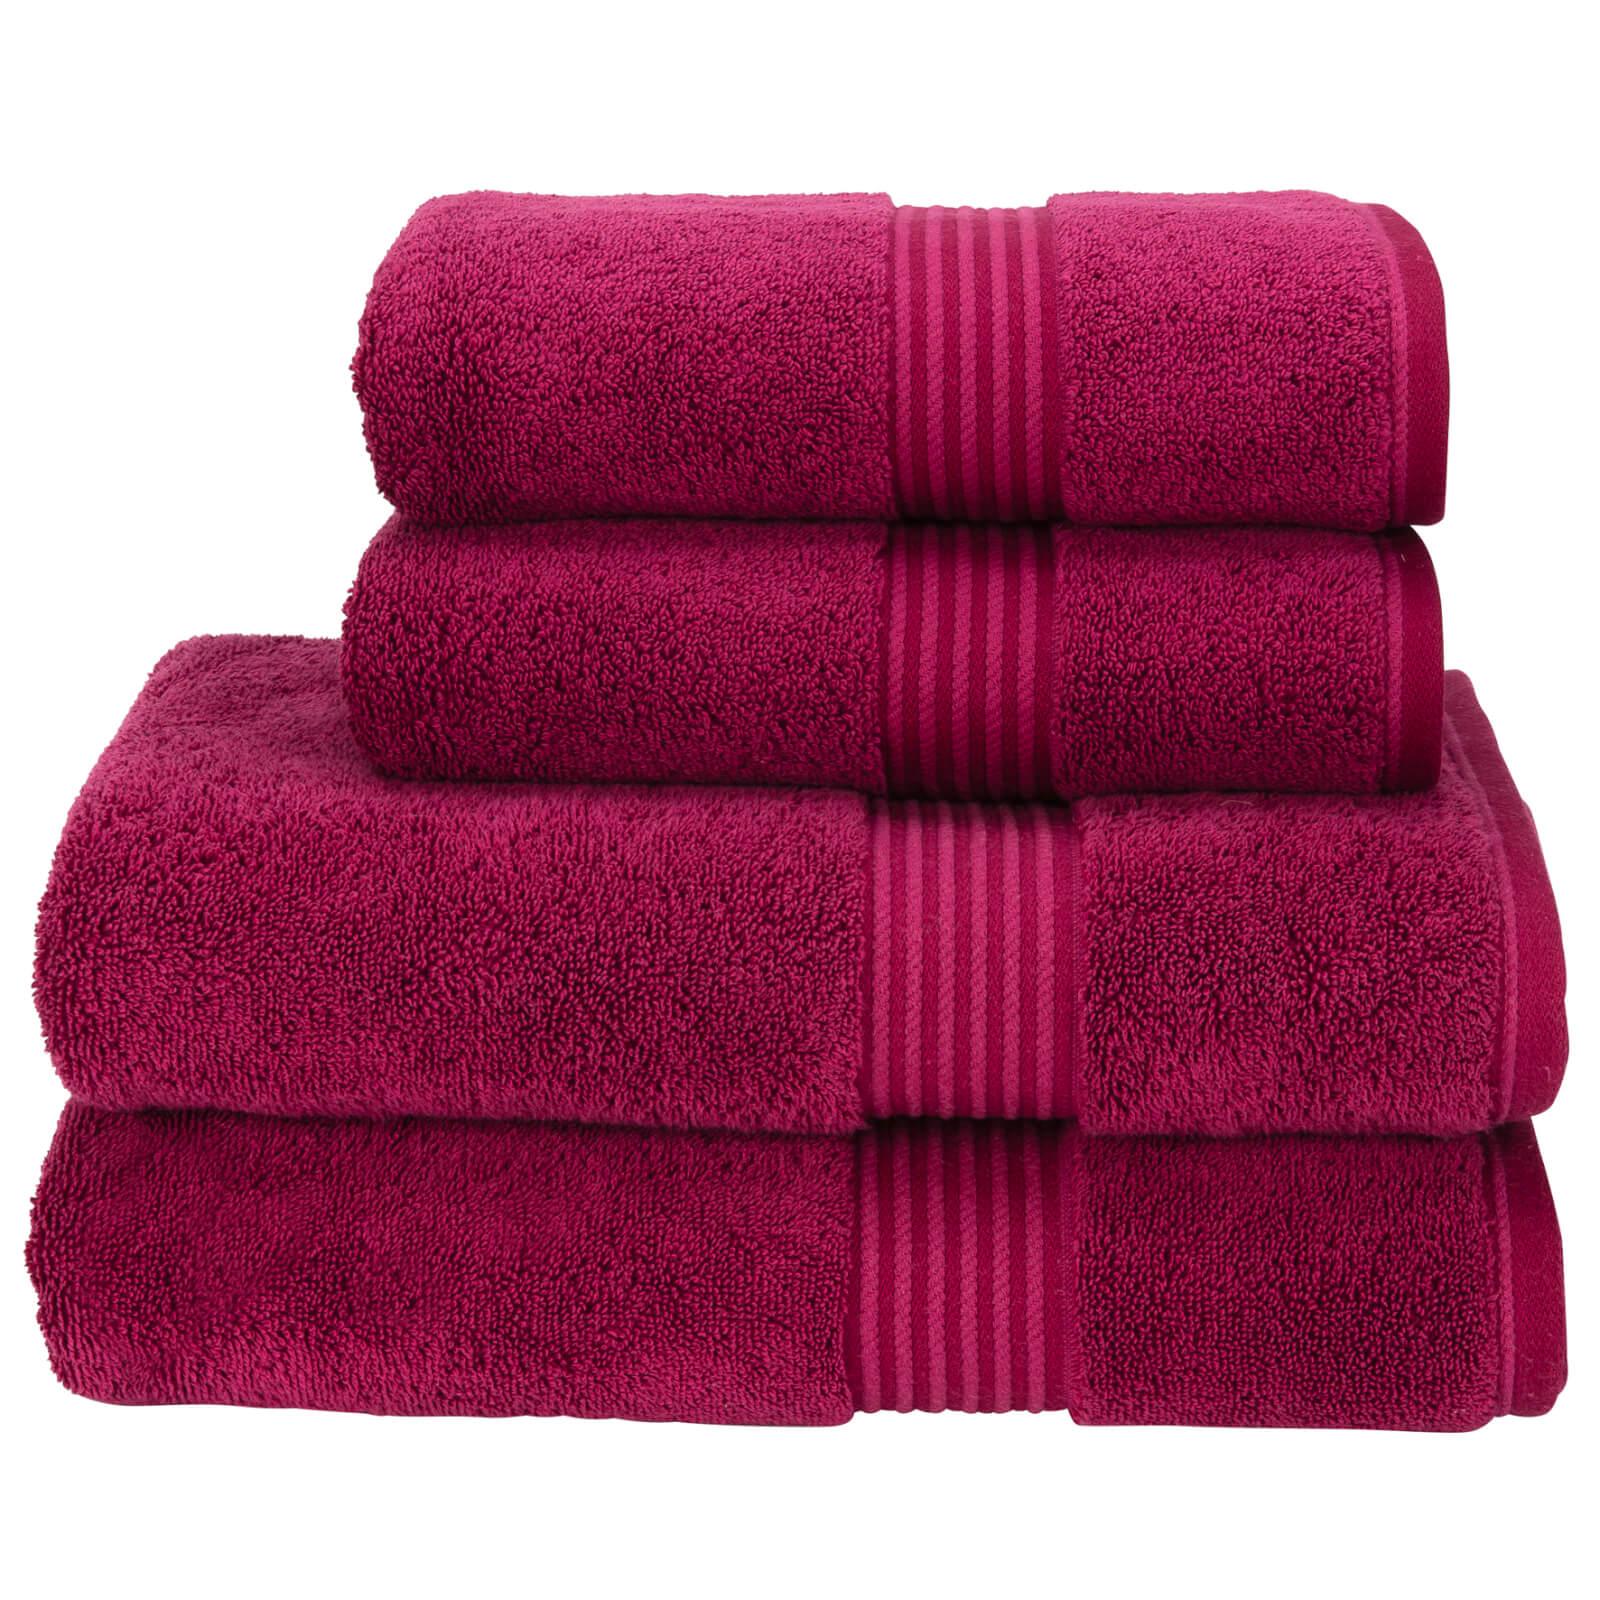 Christy Supreme Hygro Towel Range - Raspberry - Hand Towel (Set of 2) - Pink